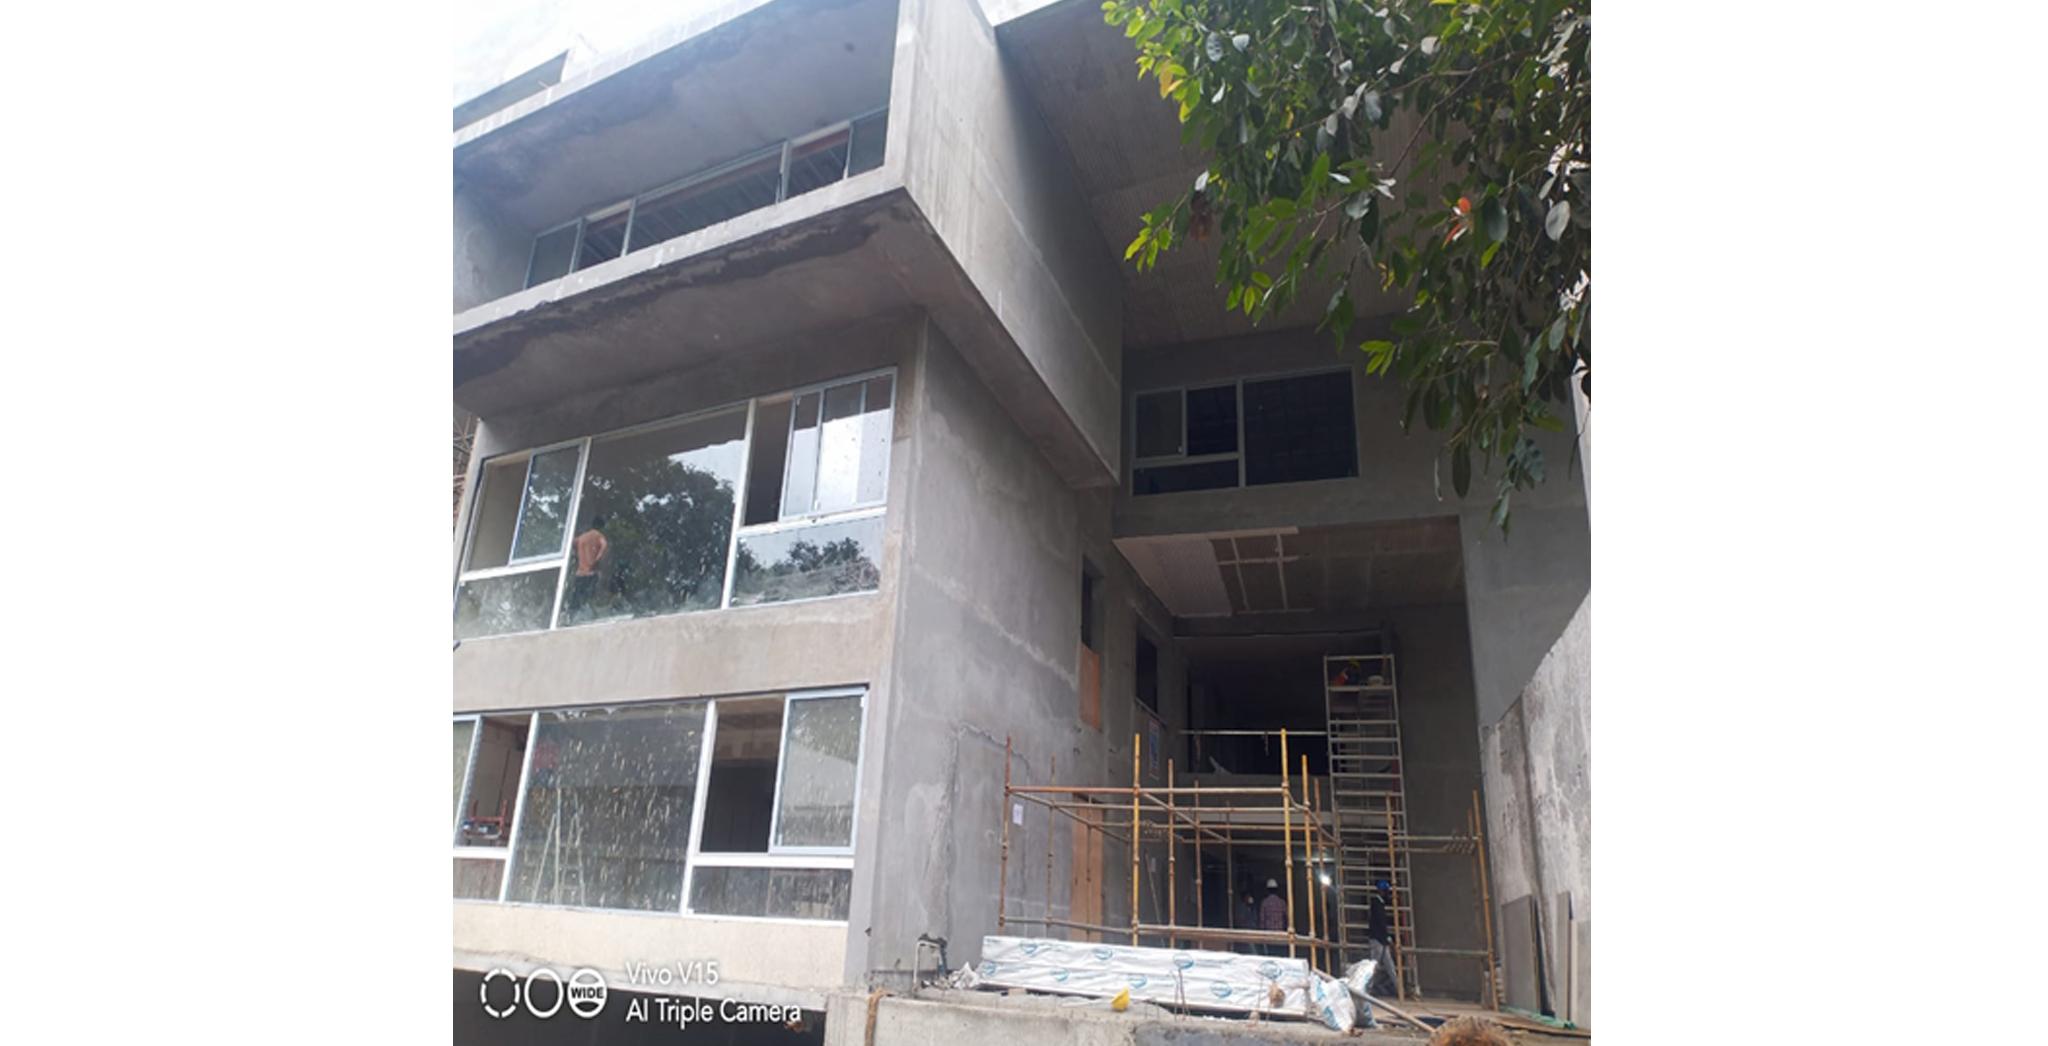 Aug 2021 - Club House: East Elevation Window